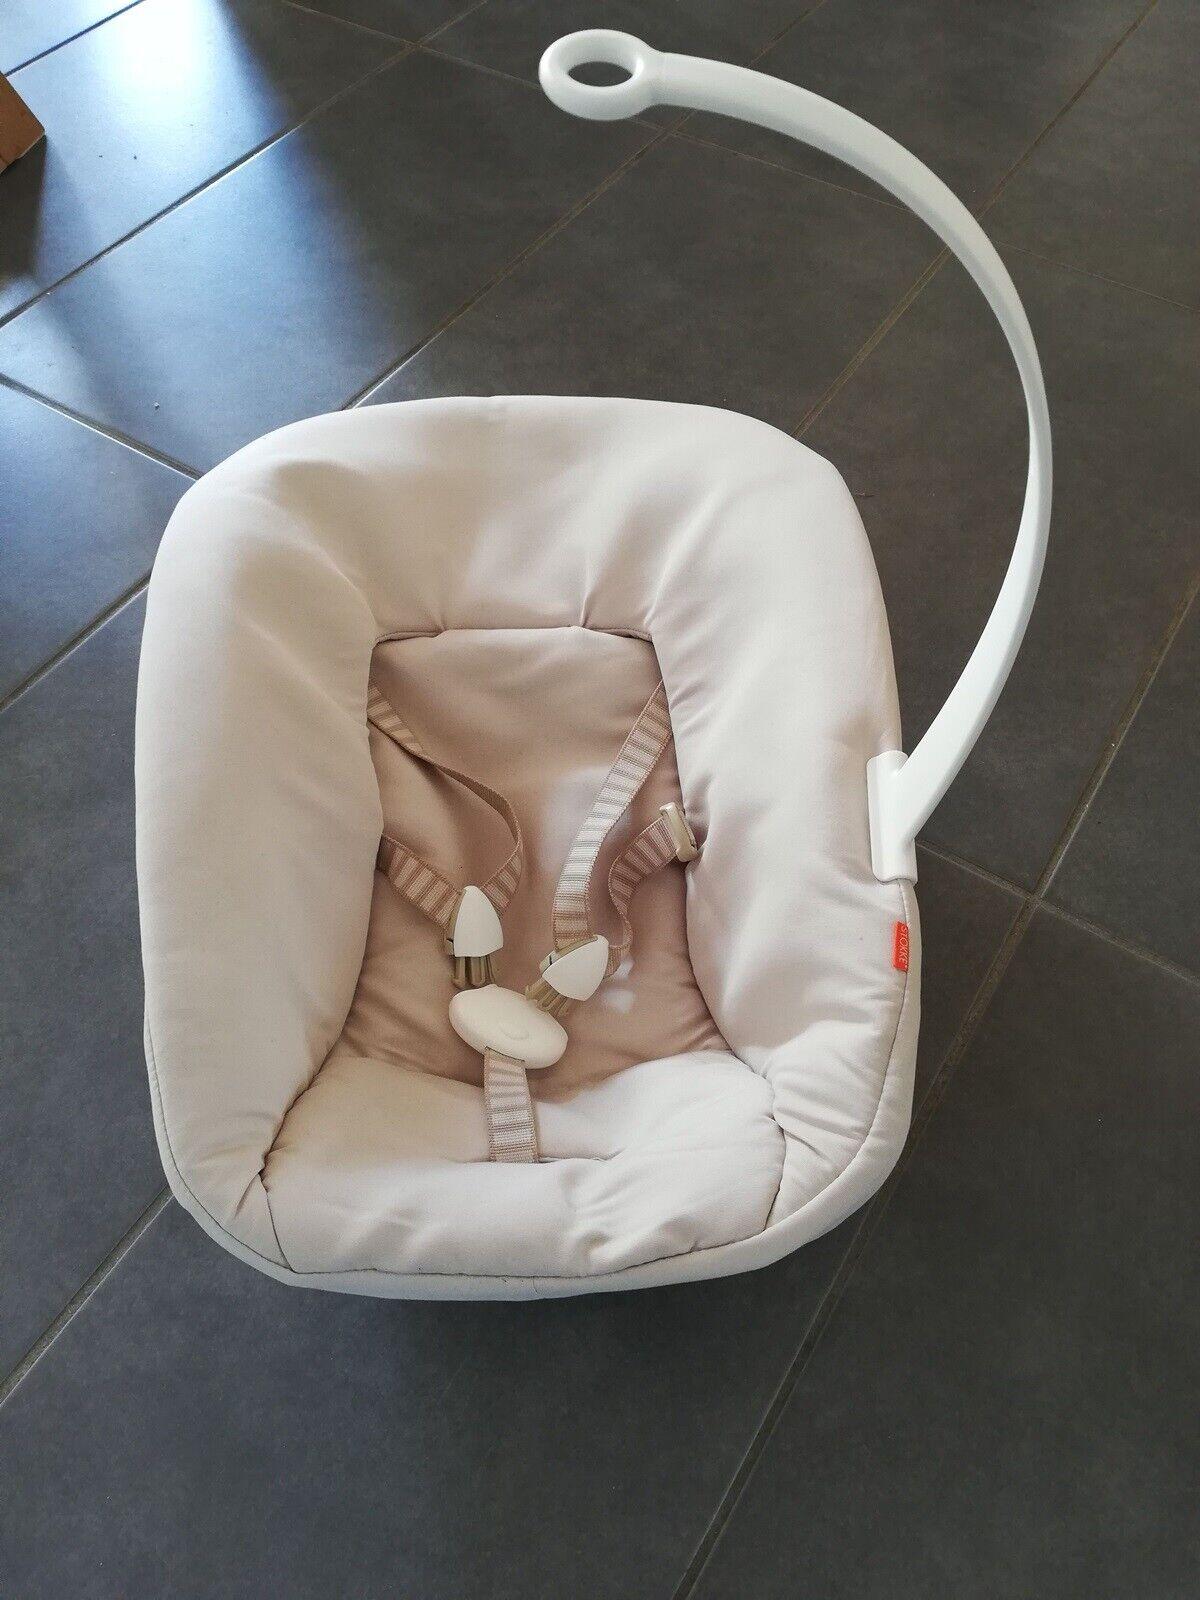 Babyindsats, Stokke New born